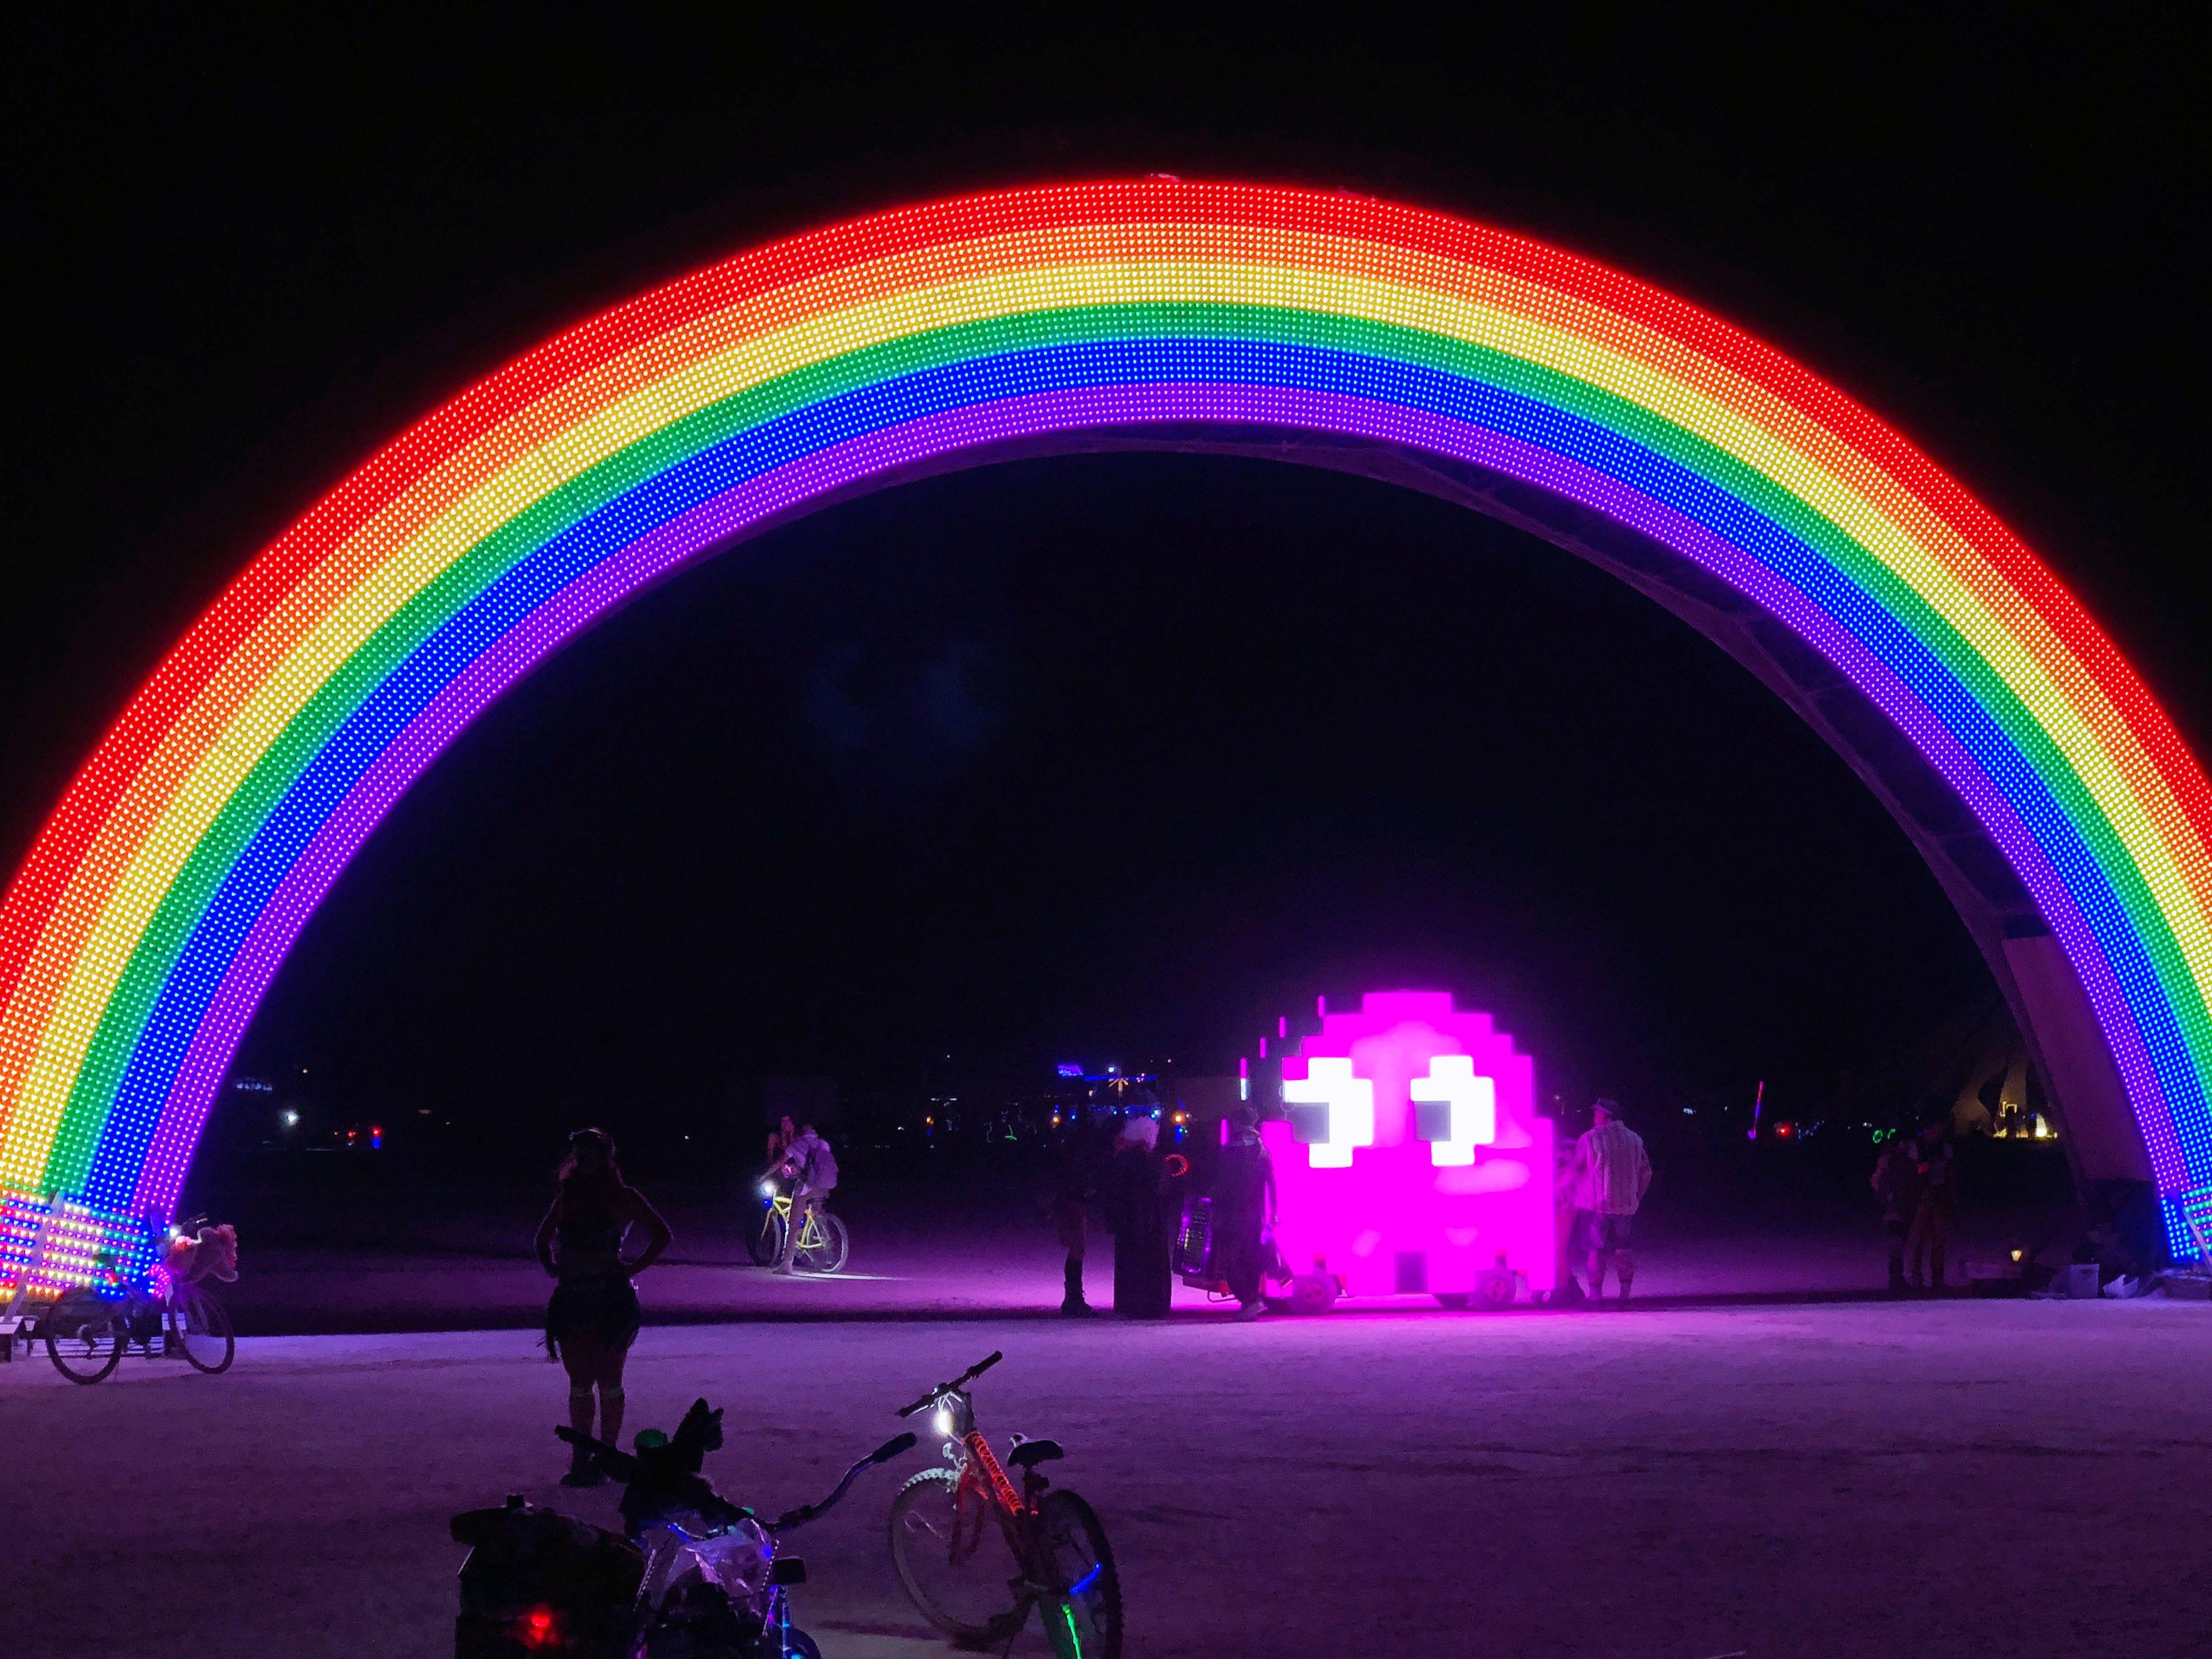 A ghost from PAC-MAN cruises beneath an illuminated rainbow bridge at Burning Man.